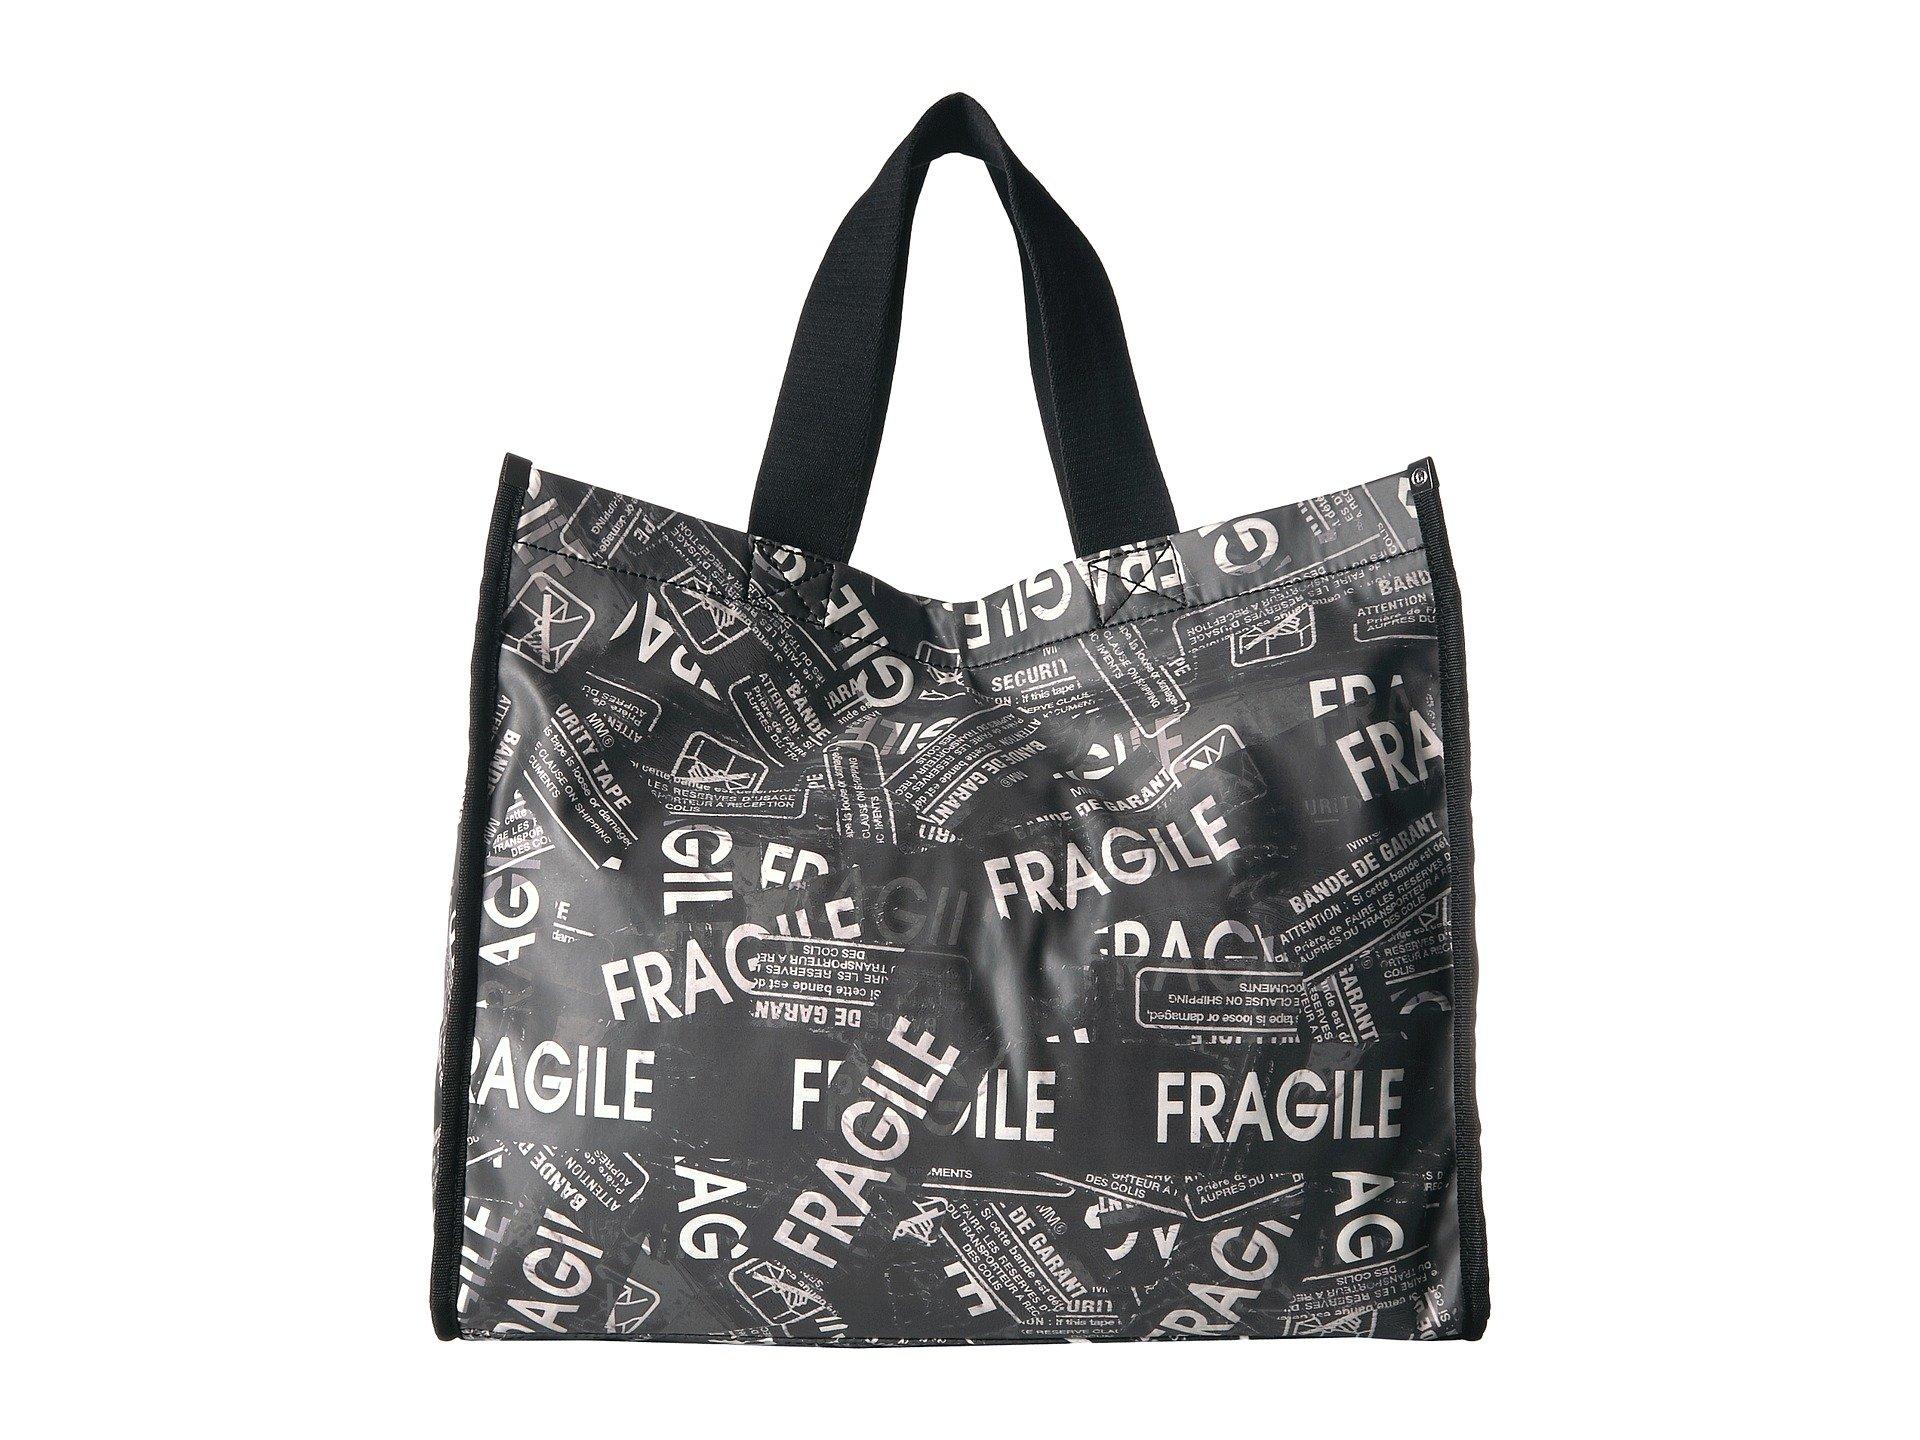 Mm6 Shopper Fragile Black Maison white Margiela Tote AqwrA